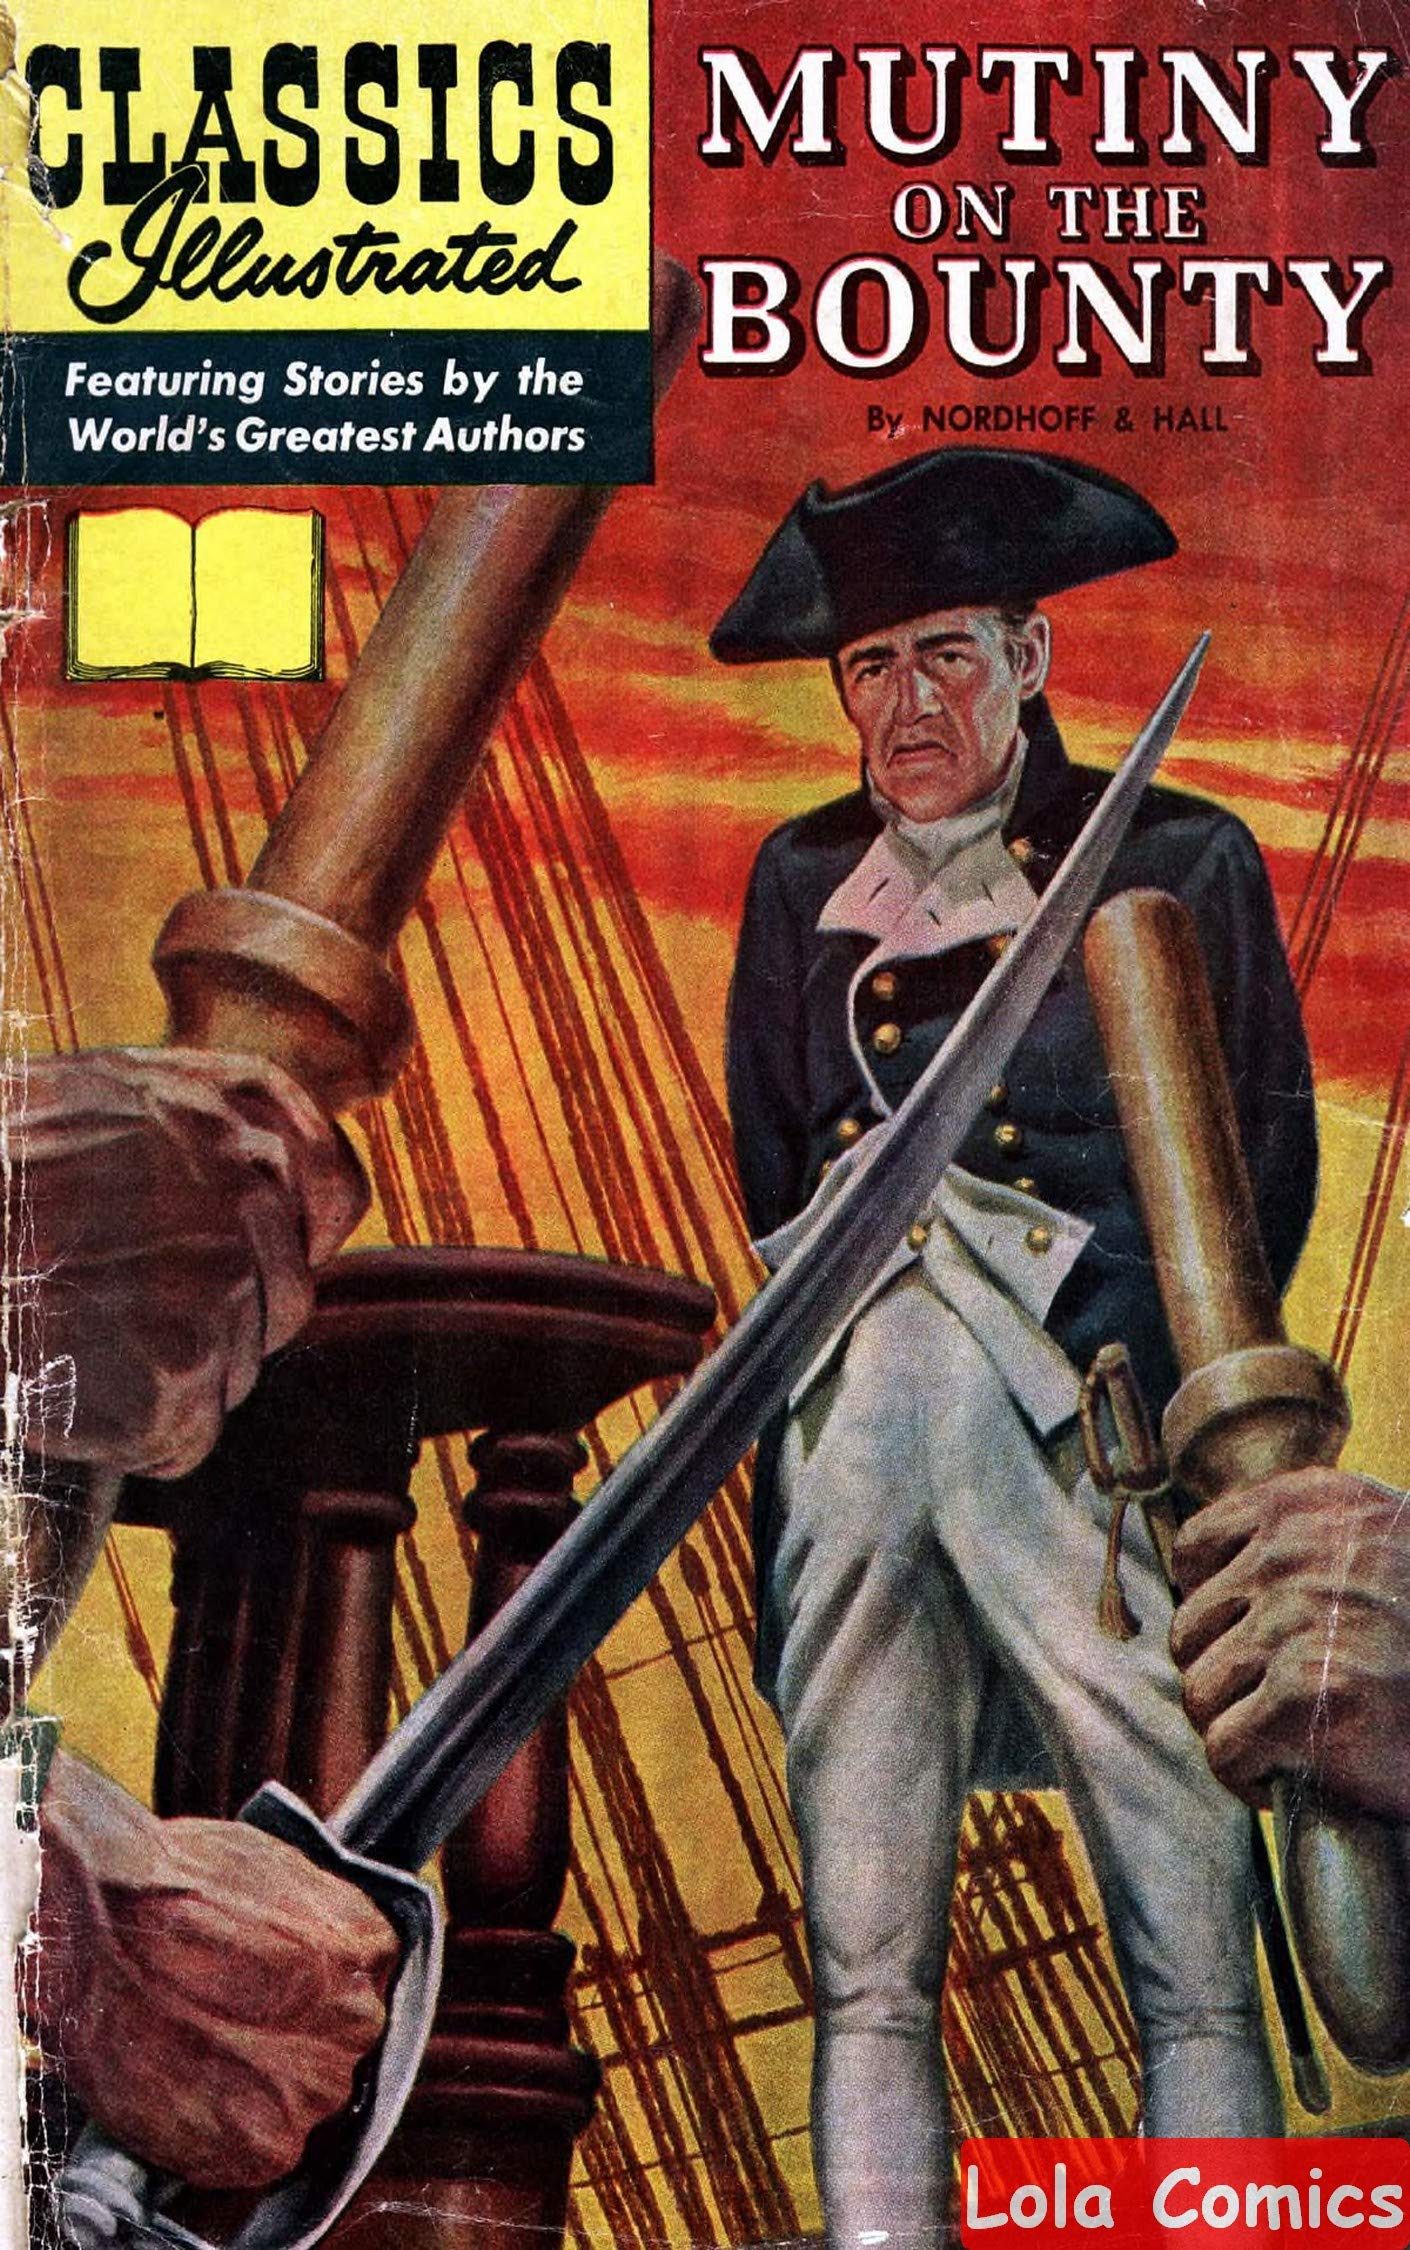 Mutiny On The Bounty-Charles Nordhoff